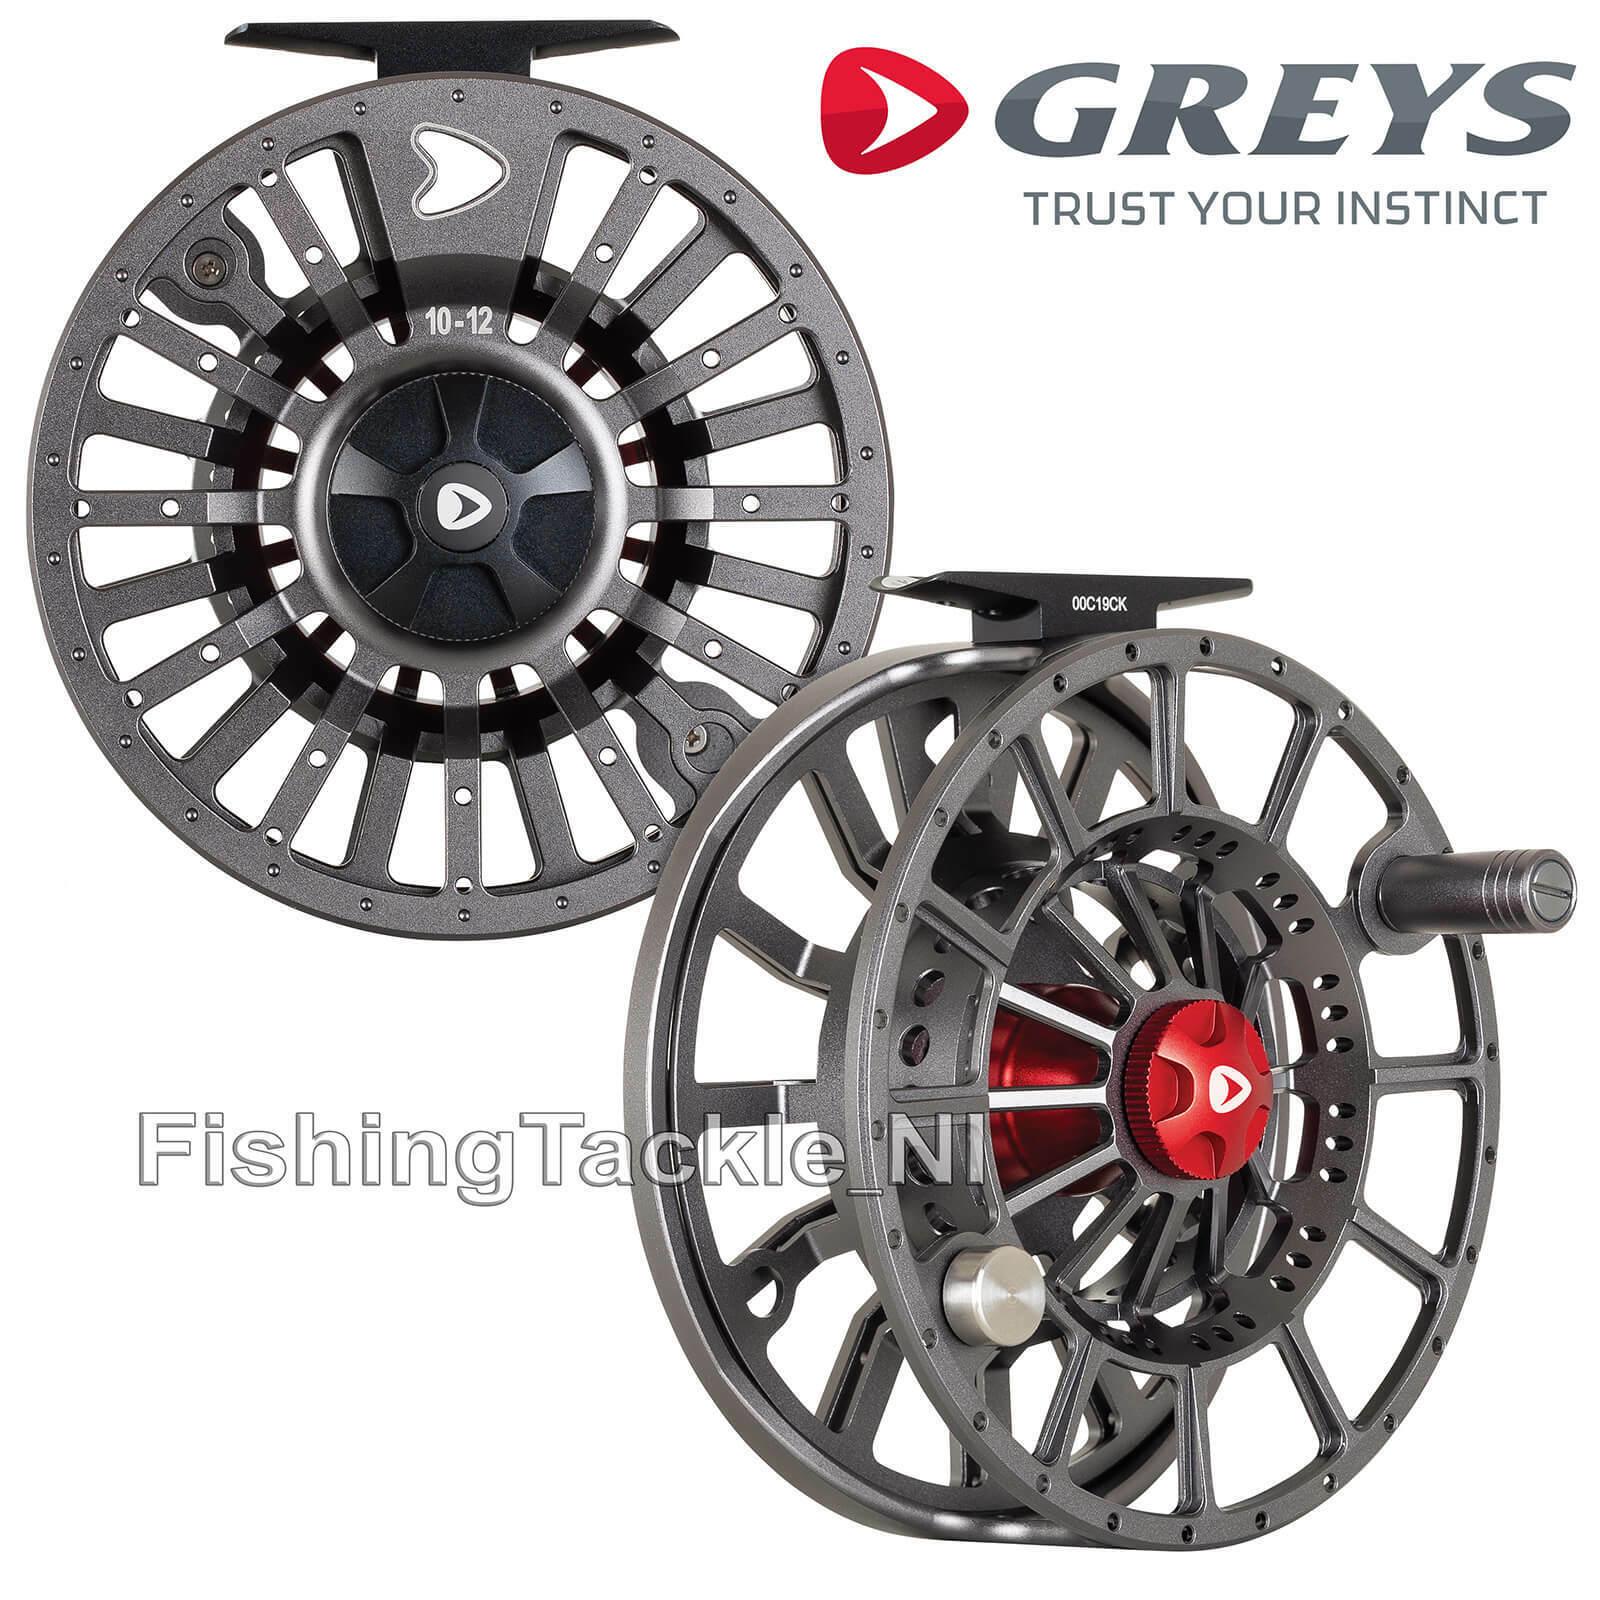 Greys GX1000 Fly Fishing Reel - Large Arbor Rulon Disc Drag Fly Reel 'NEW 2020'